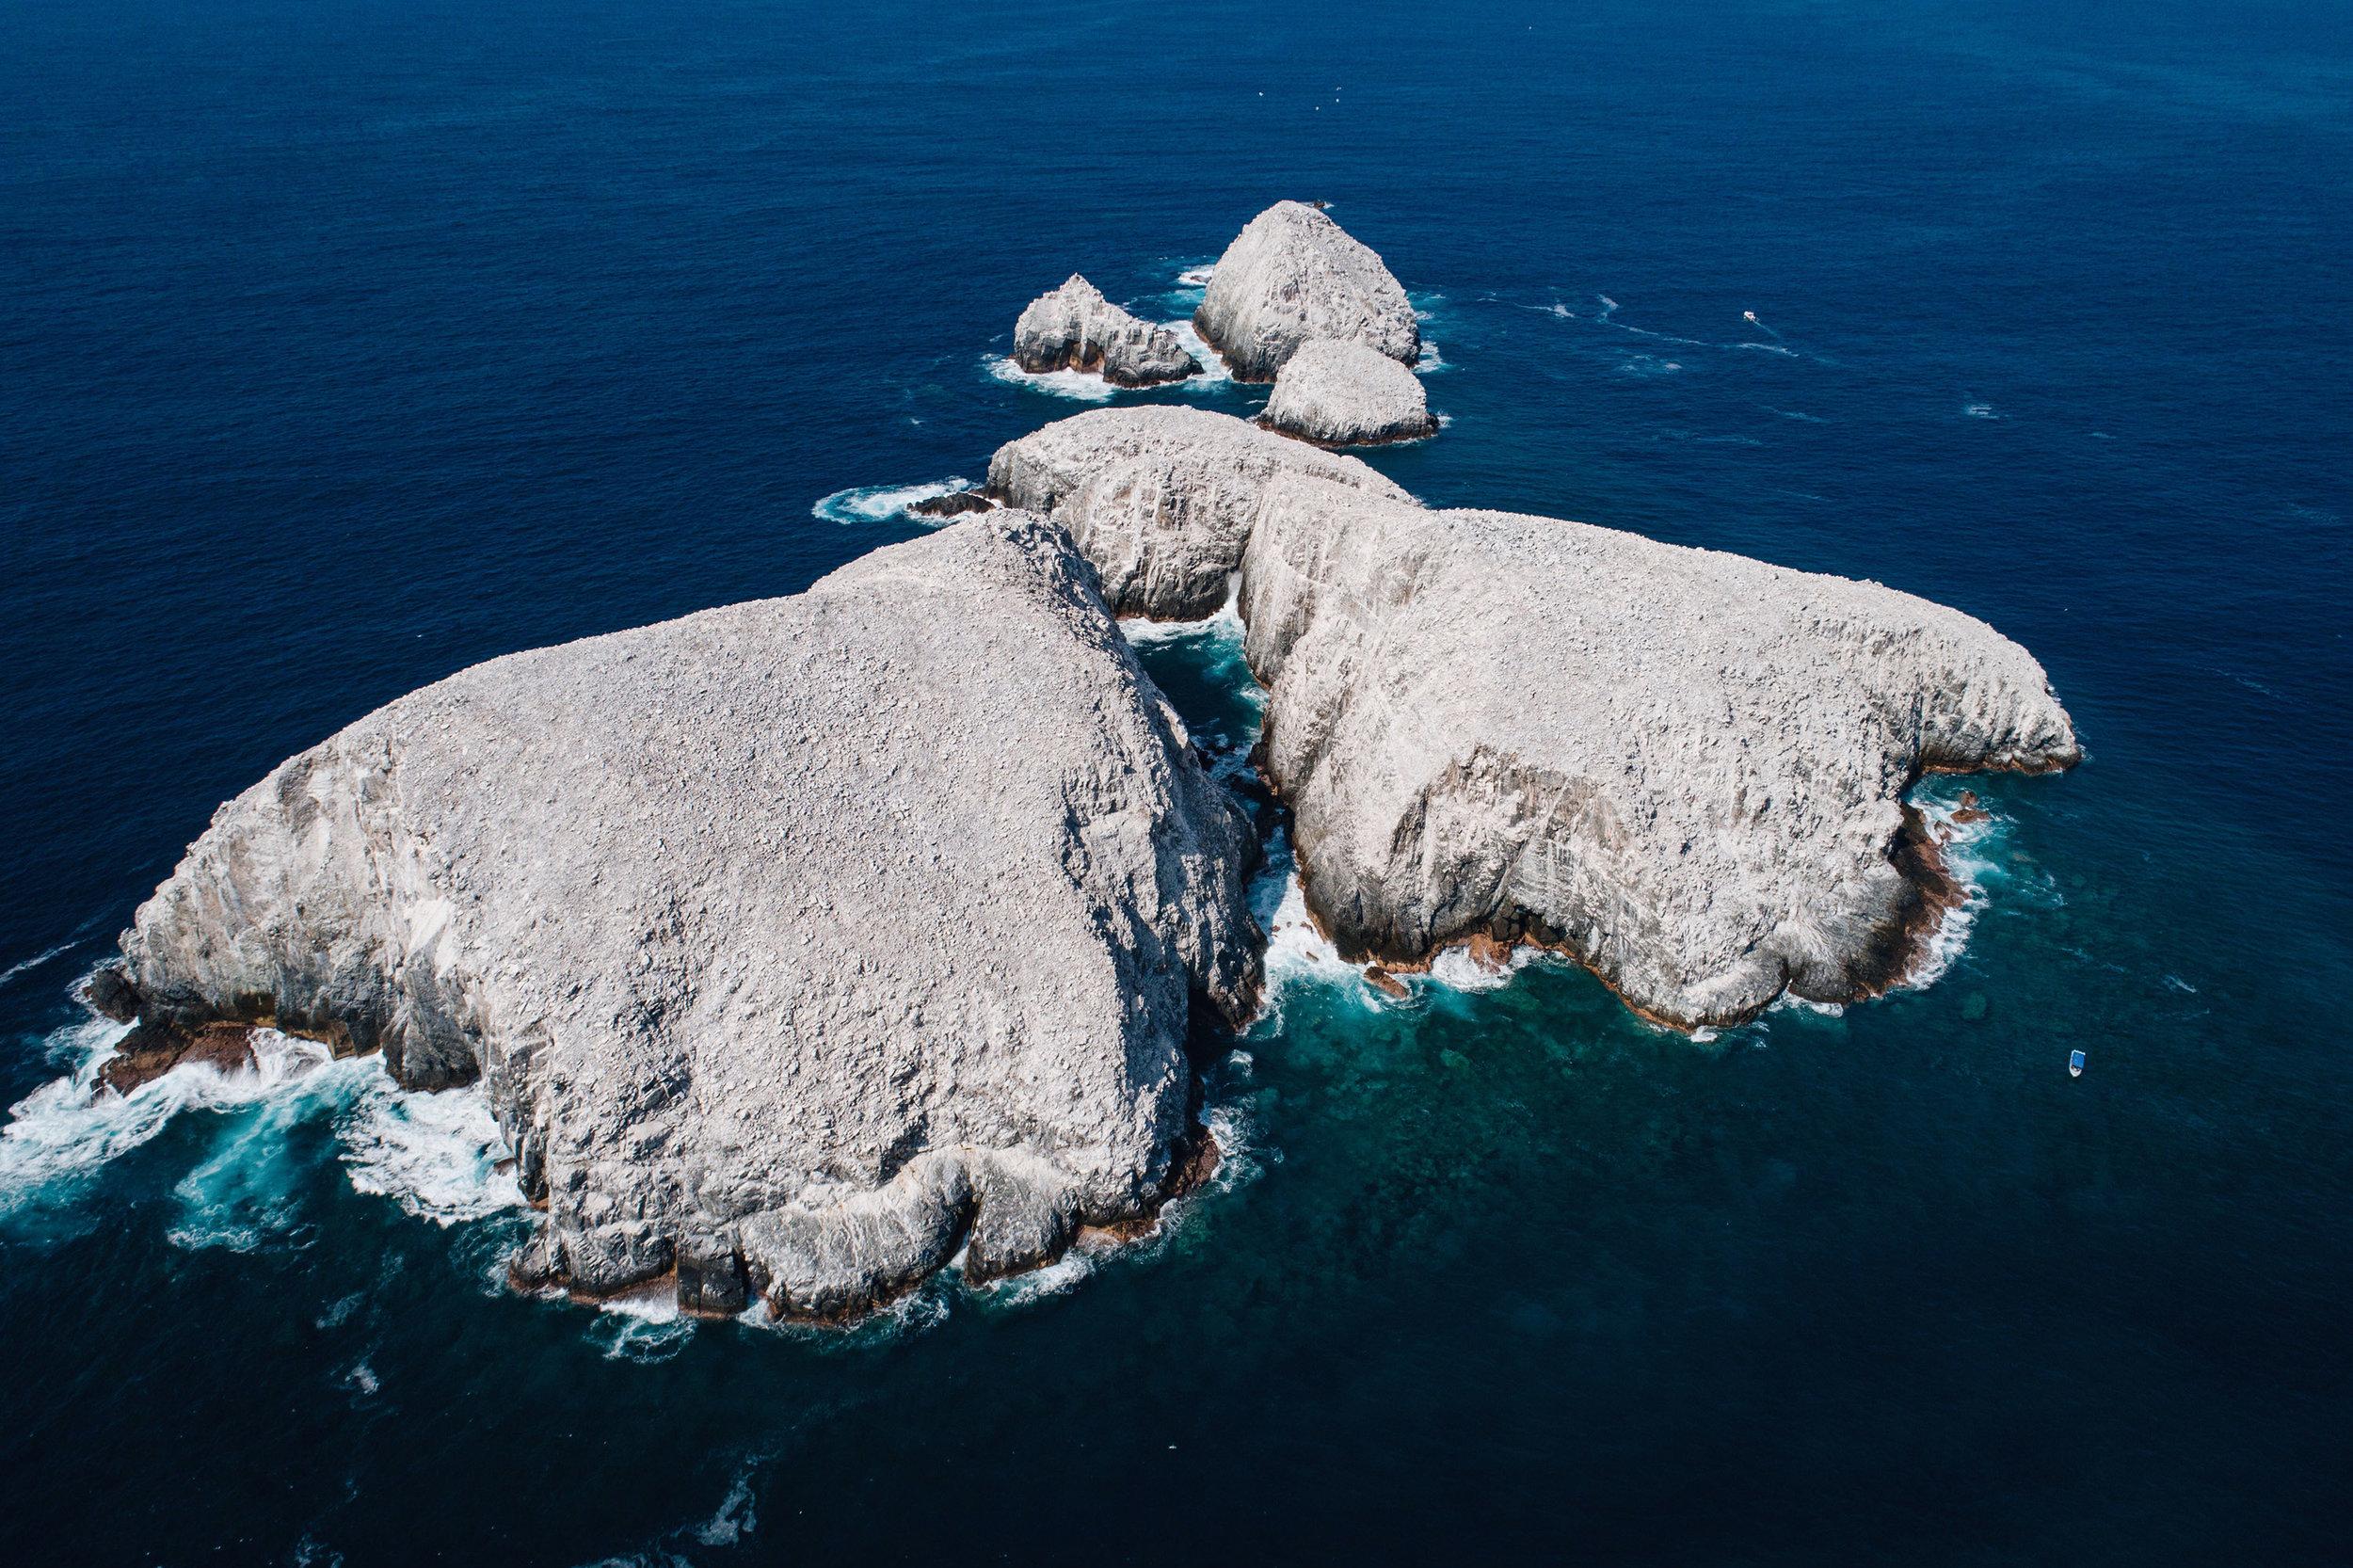 Ballenas-Ixtapa-Zihuatanejo-Fotografia-Heiko-Bothe-14.JPG